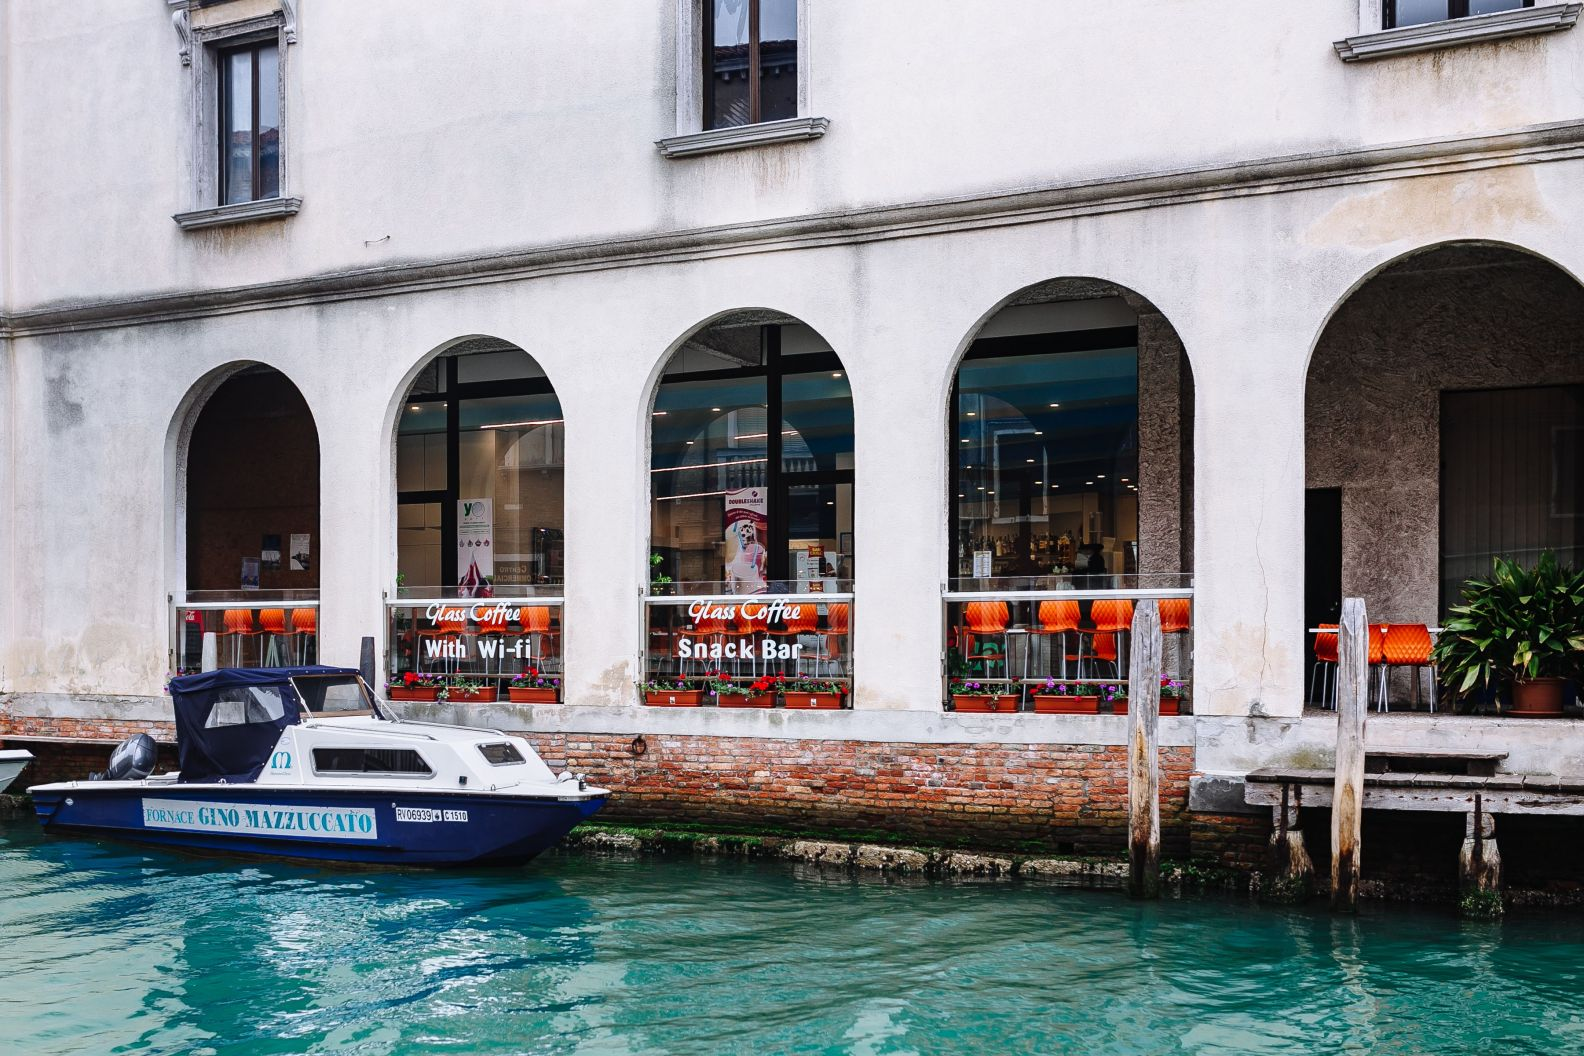 kaboompics_The beautiful and colorful Murano Island, Italy.jpg